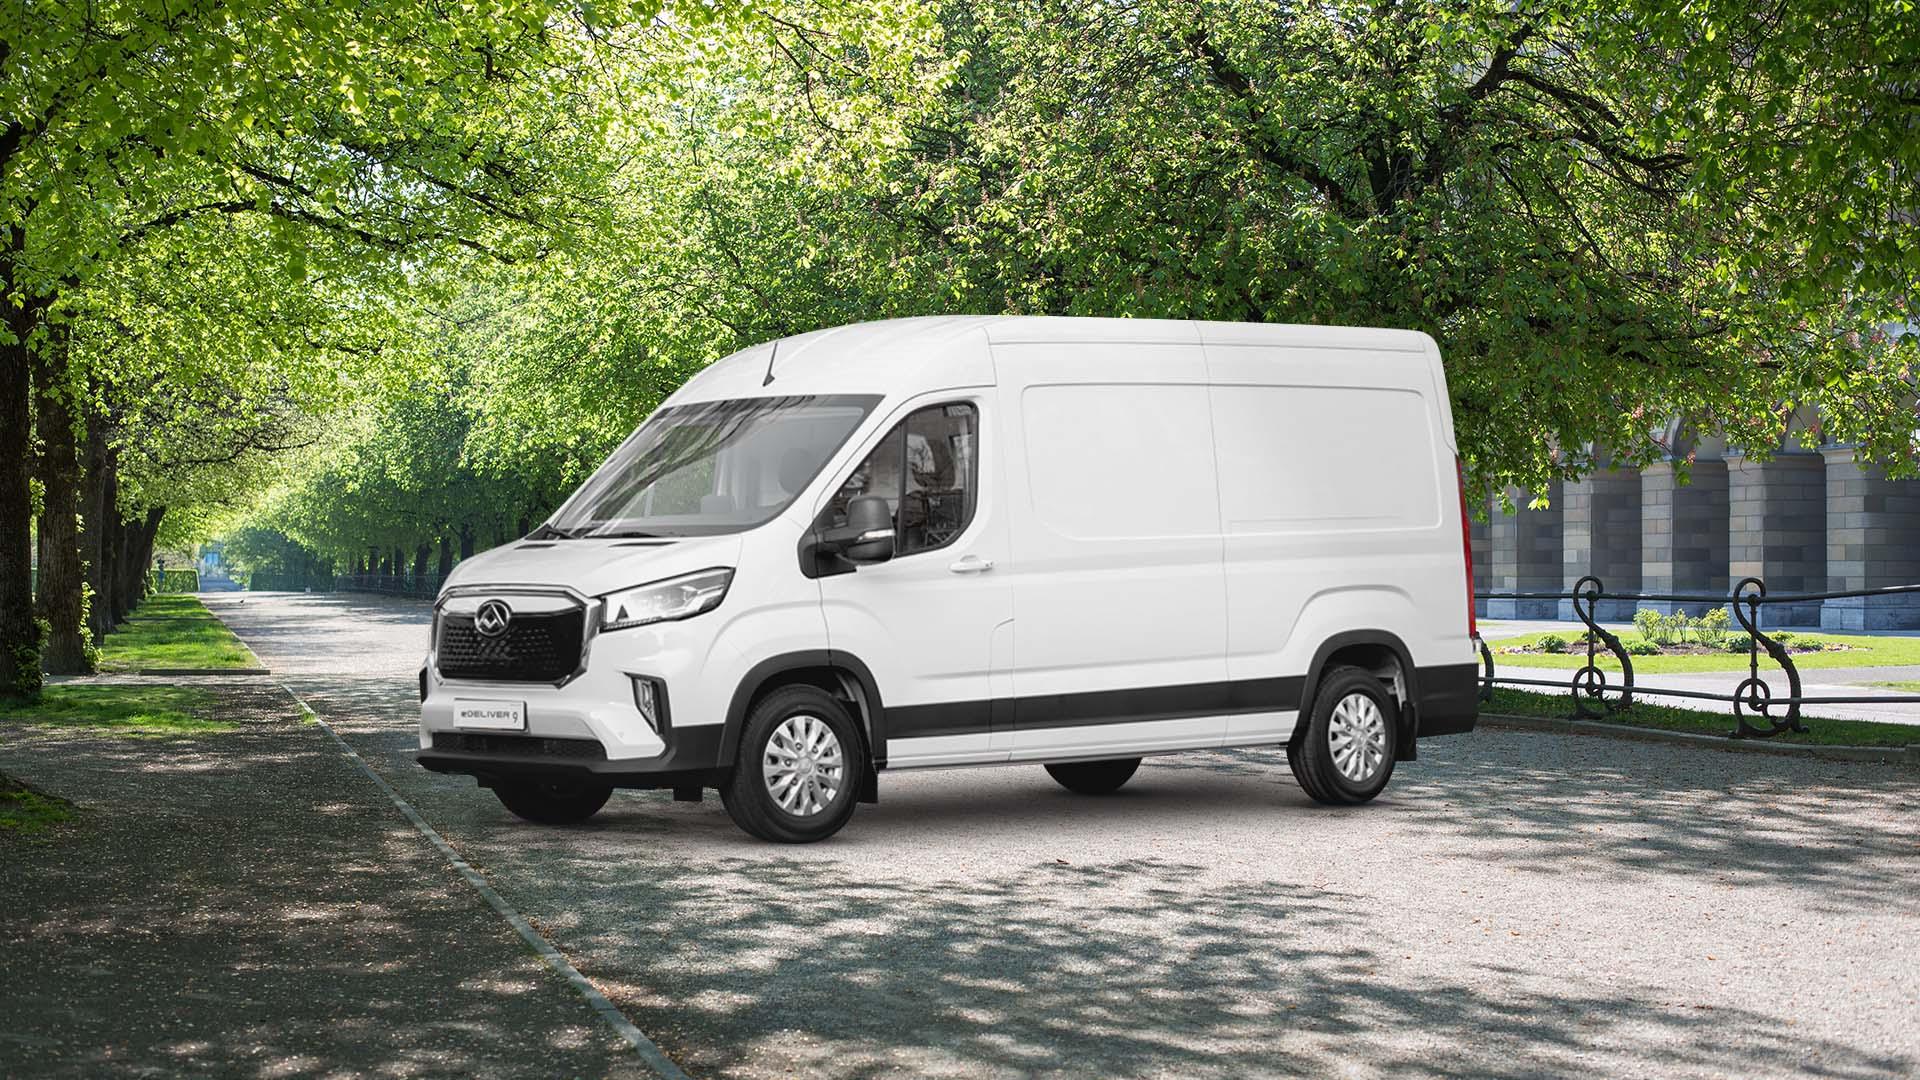 Maxus eDeliver 9 100% elektrisch von Preckel Automobile